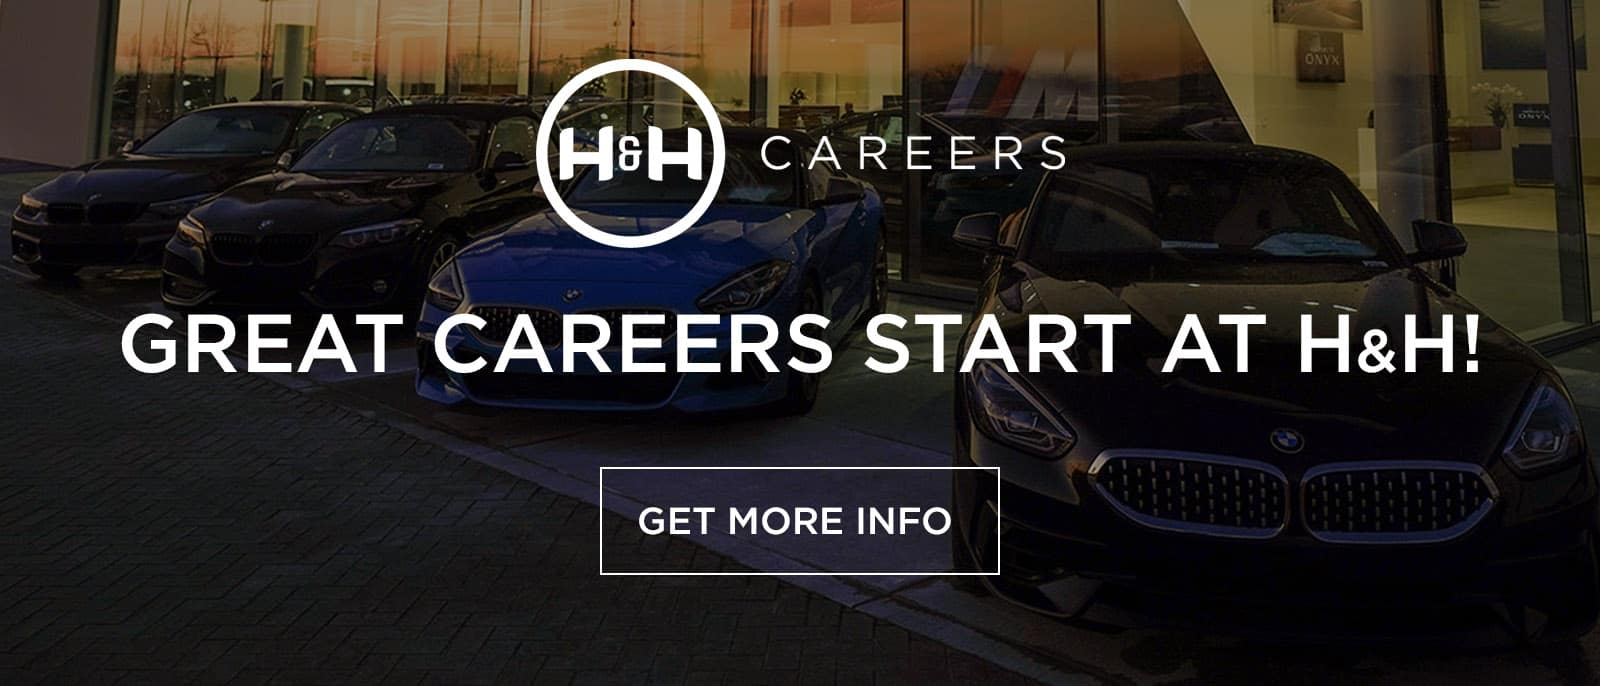 hh auto jobs rotator